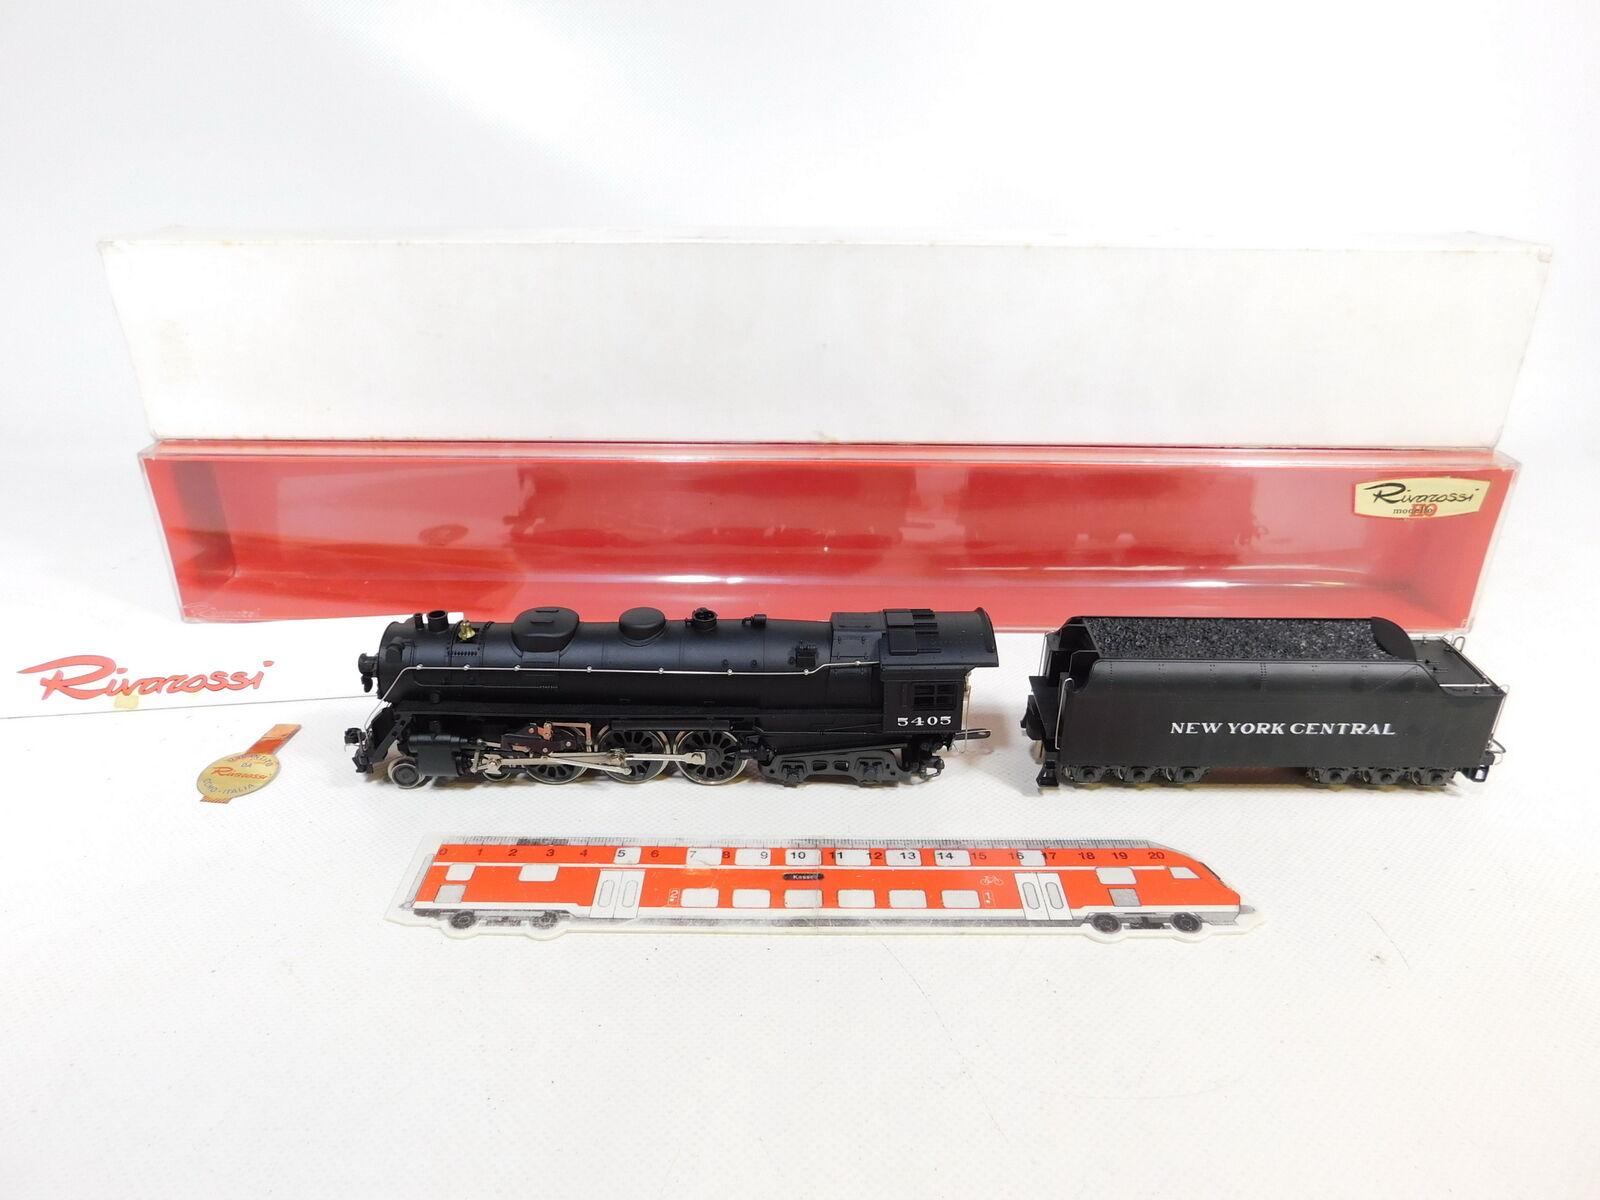 Ce266-2  Rivarossi h0 dc 1252 us-máquina de vapor Hudson 5405 New York Central, Neuw + embalaje original